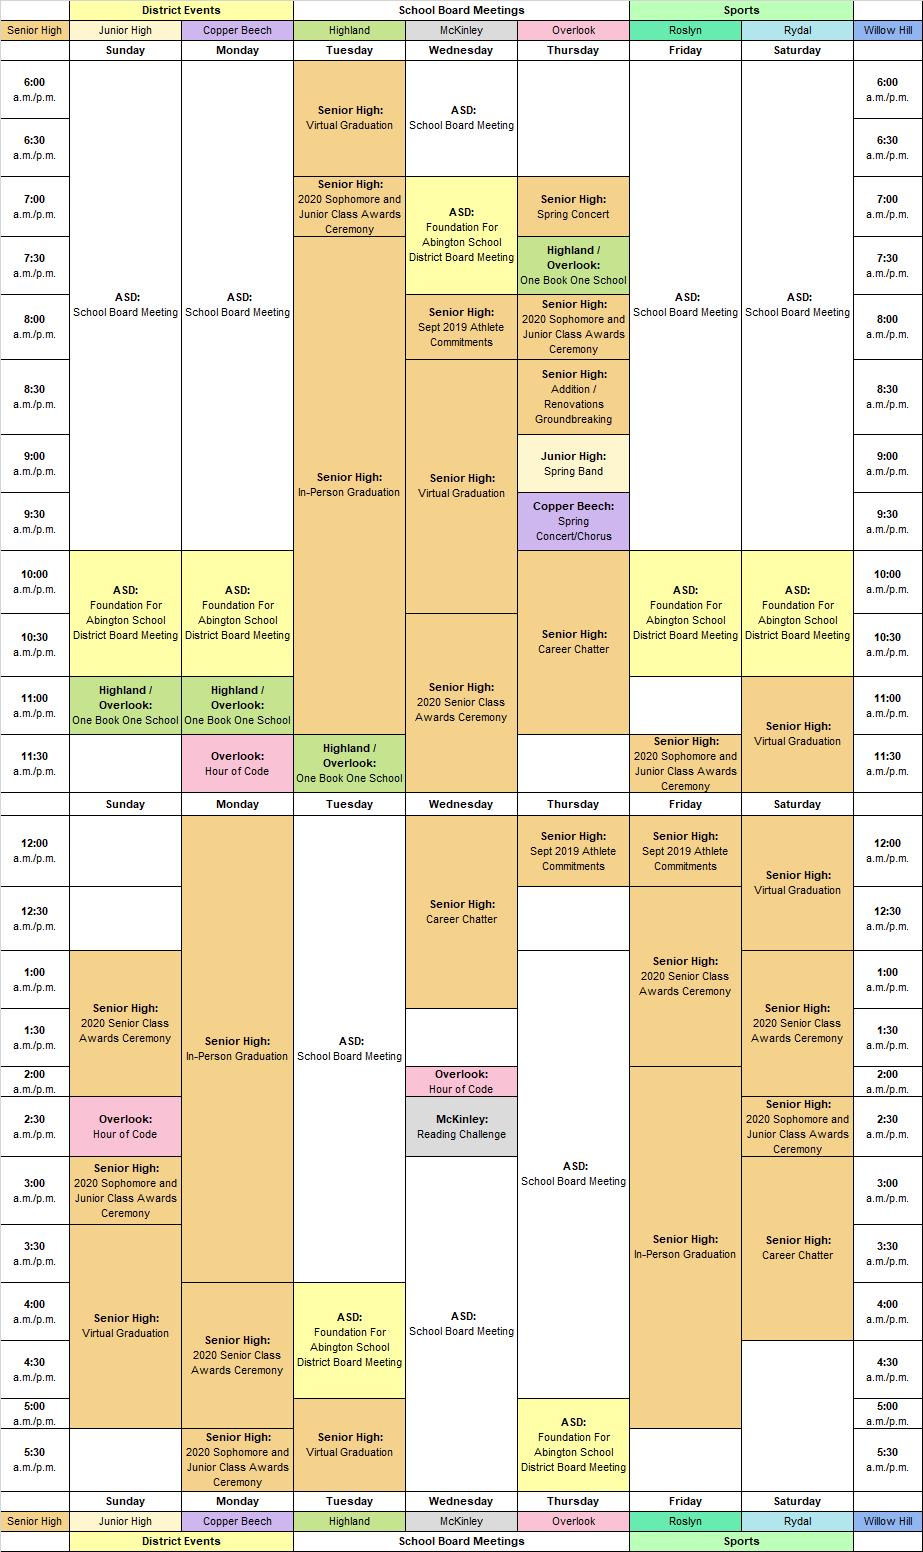 abington media productions - amp-tv: programming guide | abington